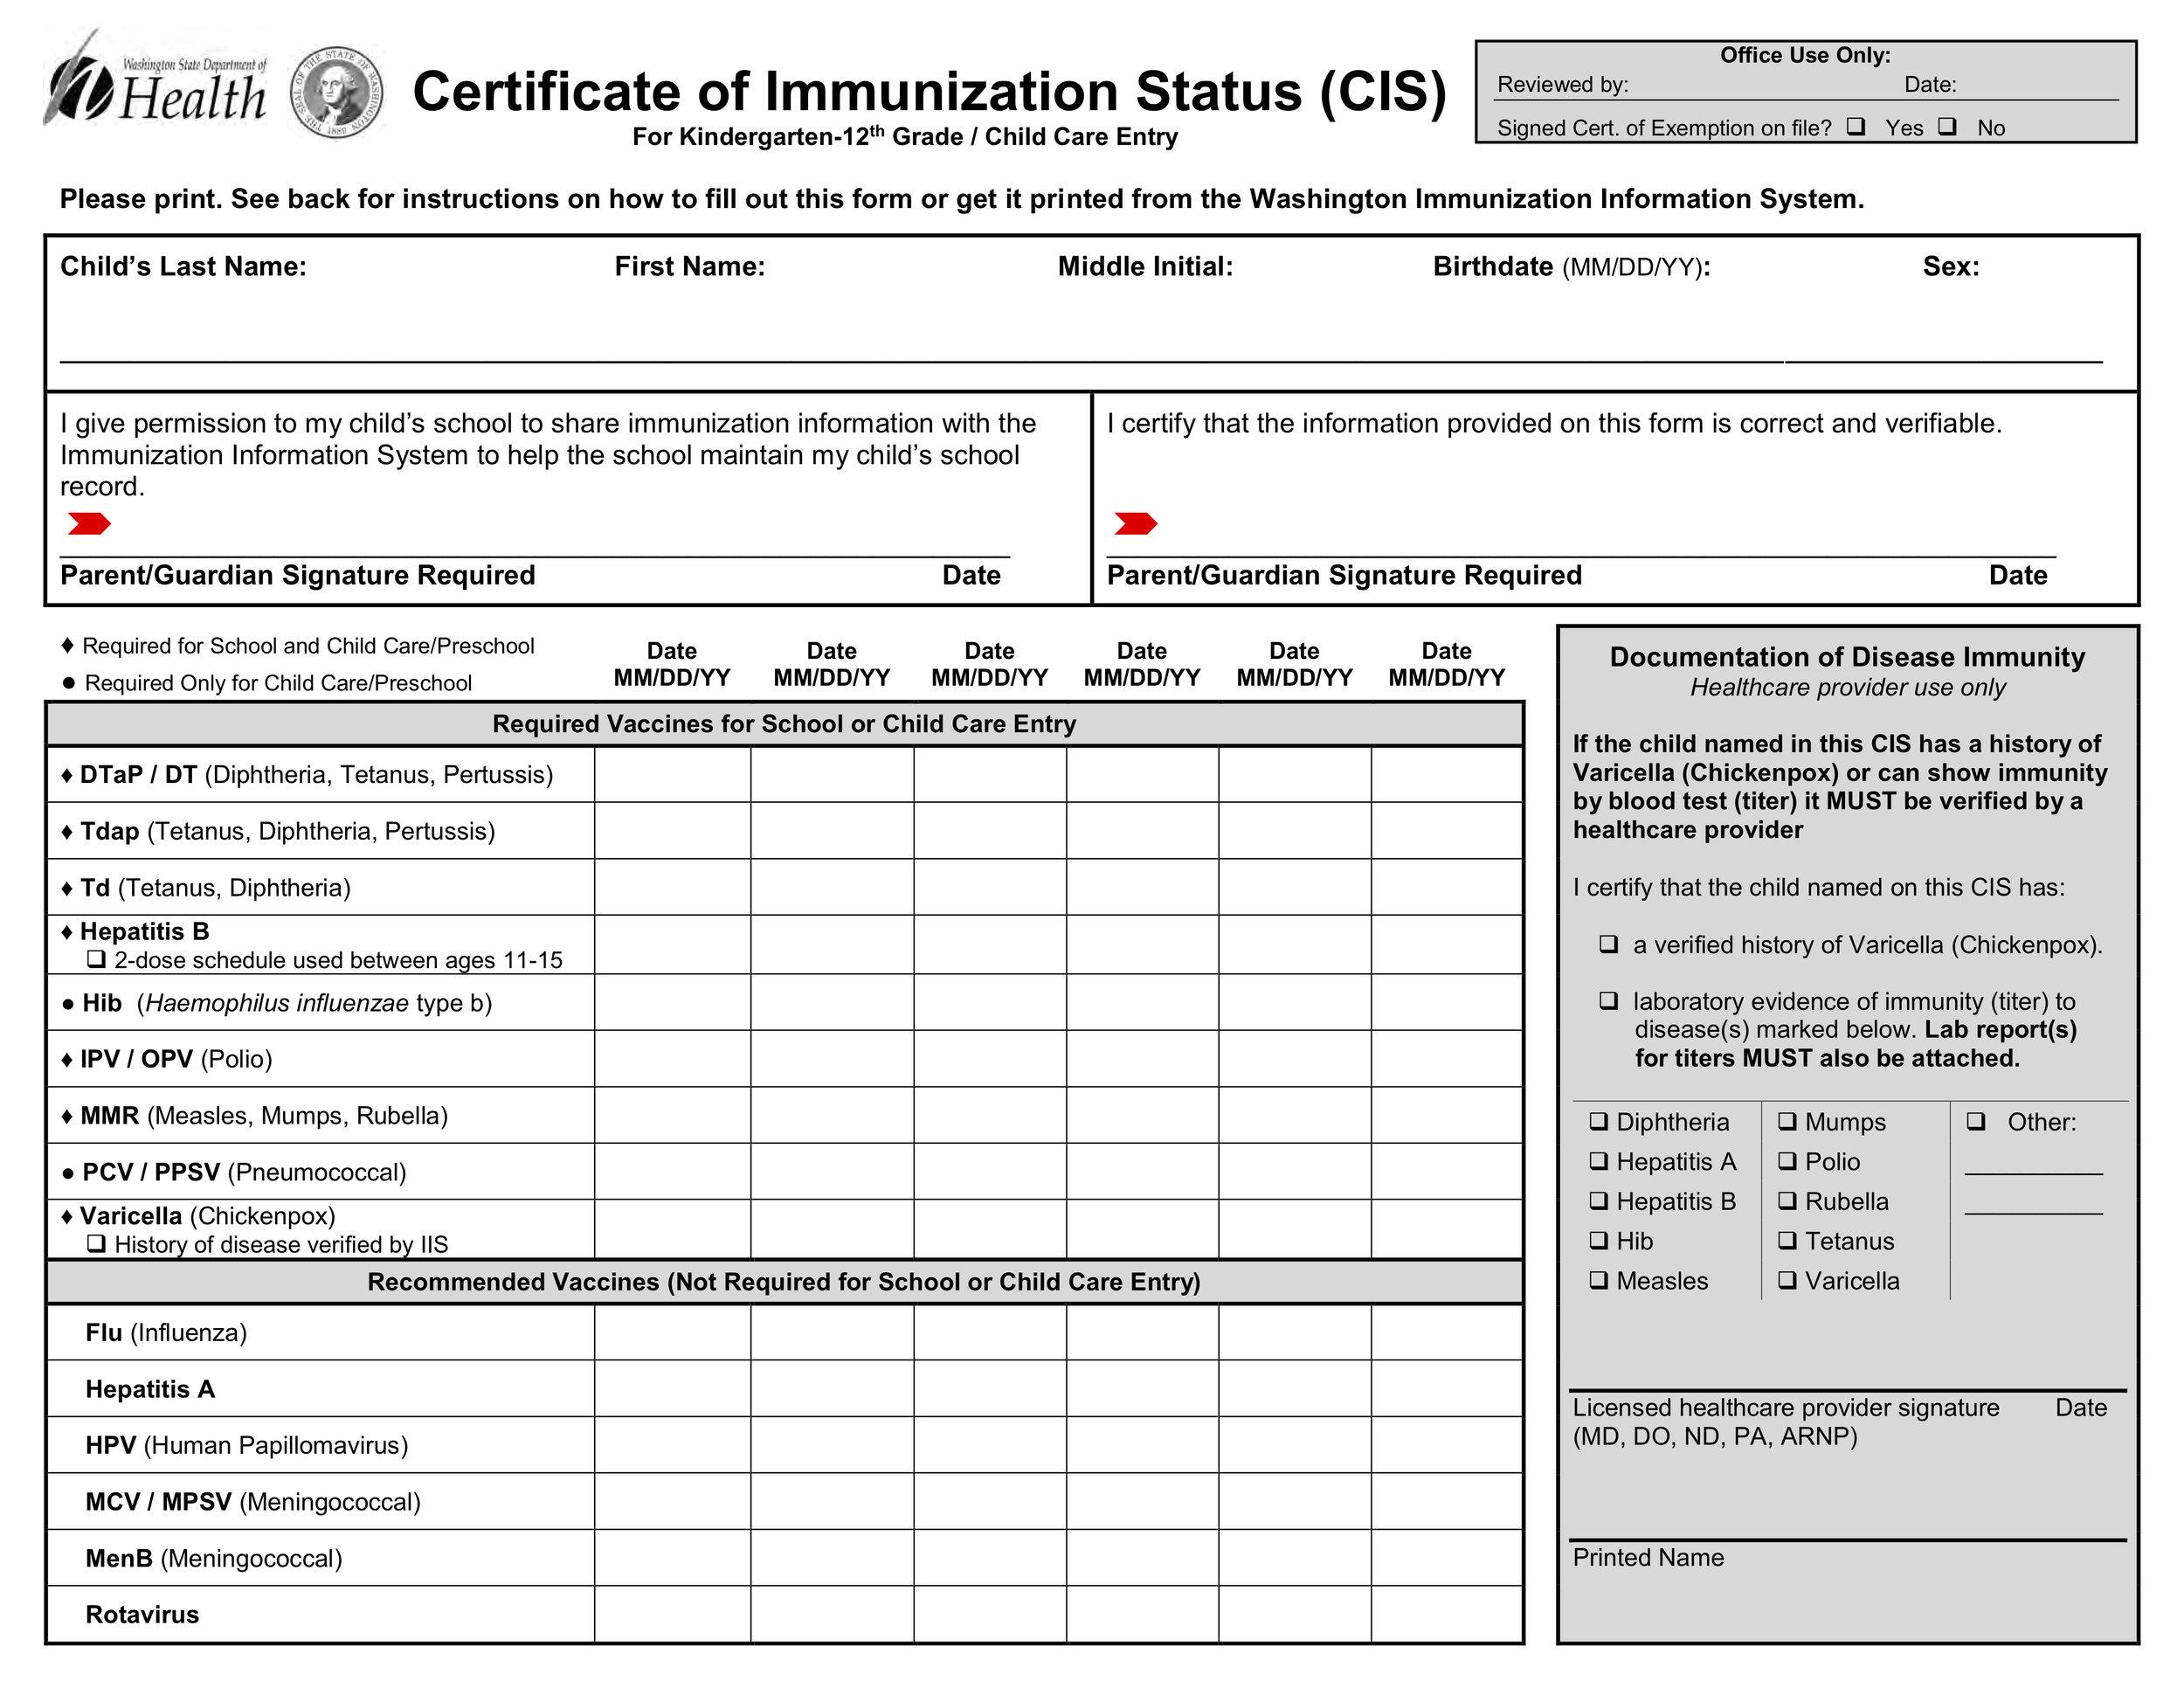 Immunization Form.jpg